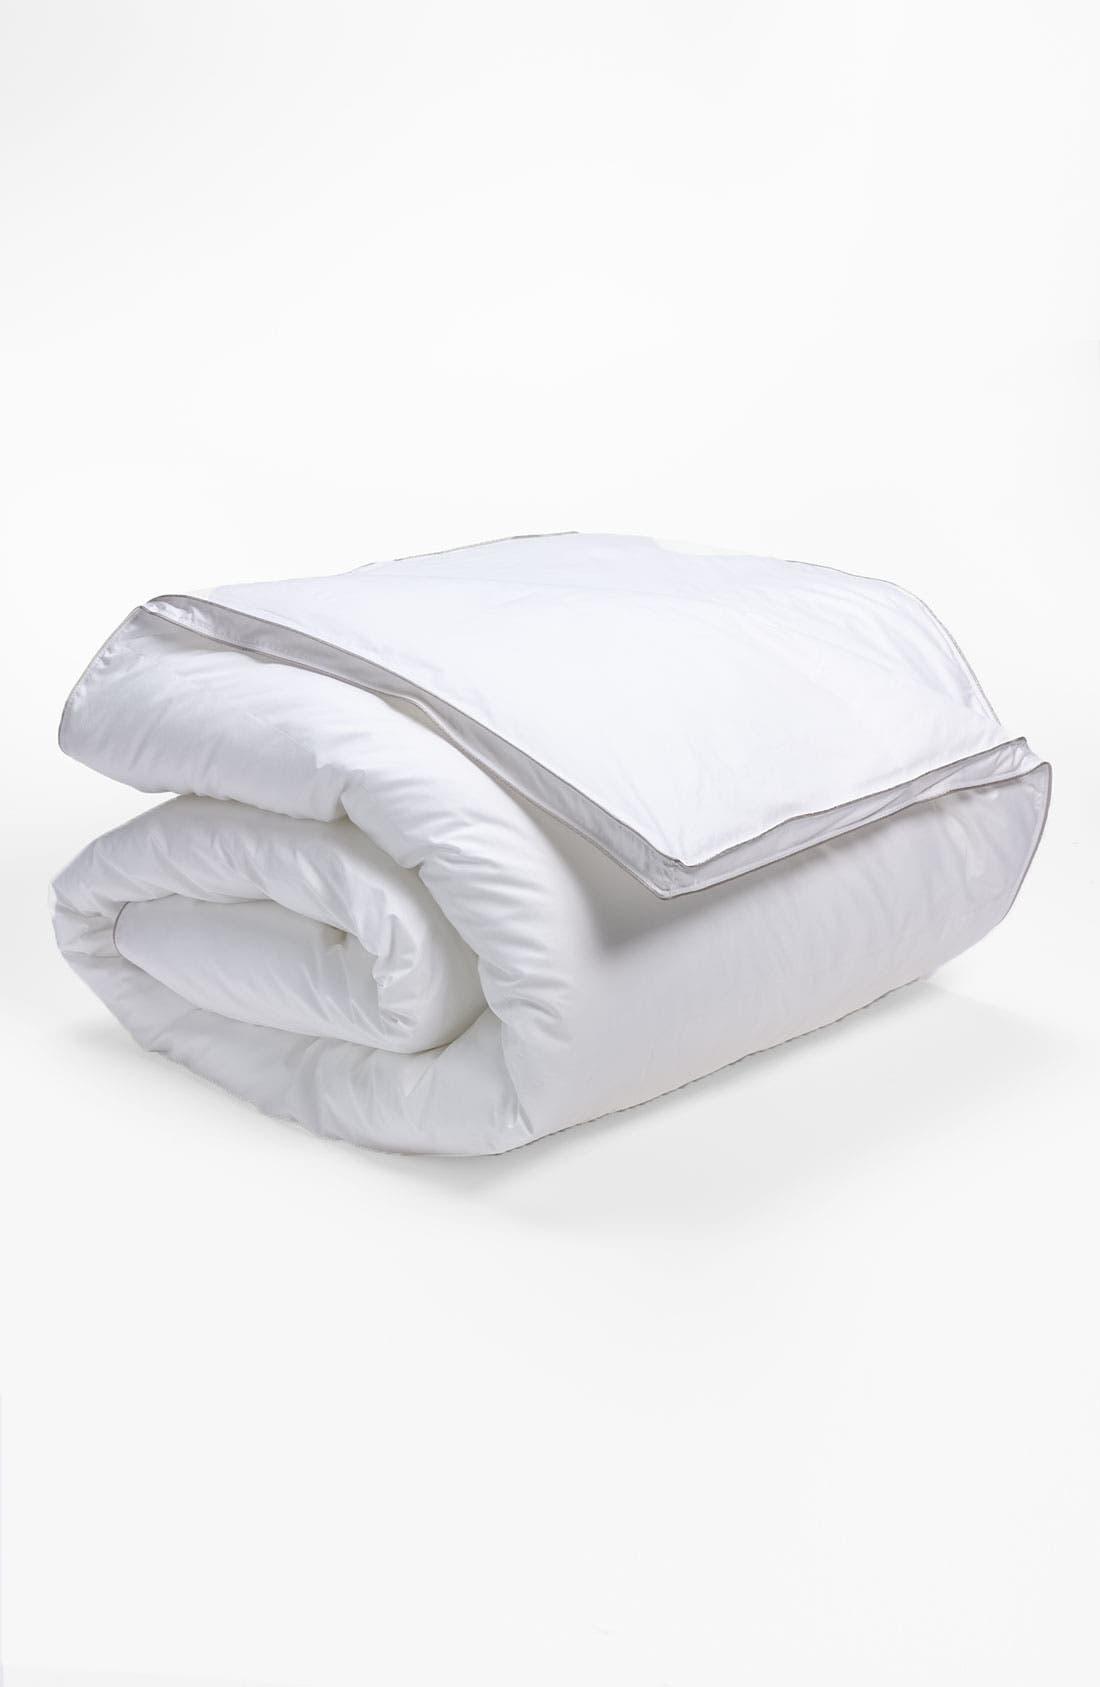 Alternate Image 1 Selected - Nordstrom at Home Down Alternative Comforter